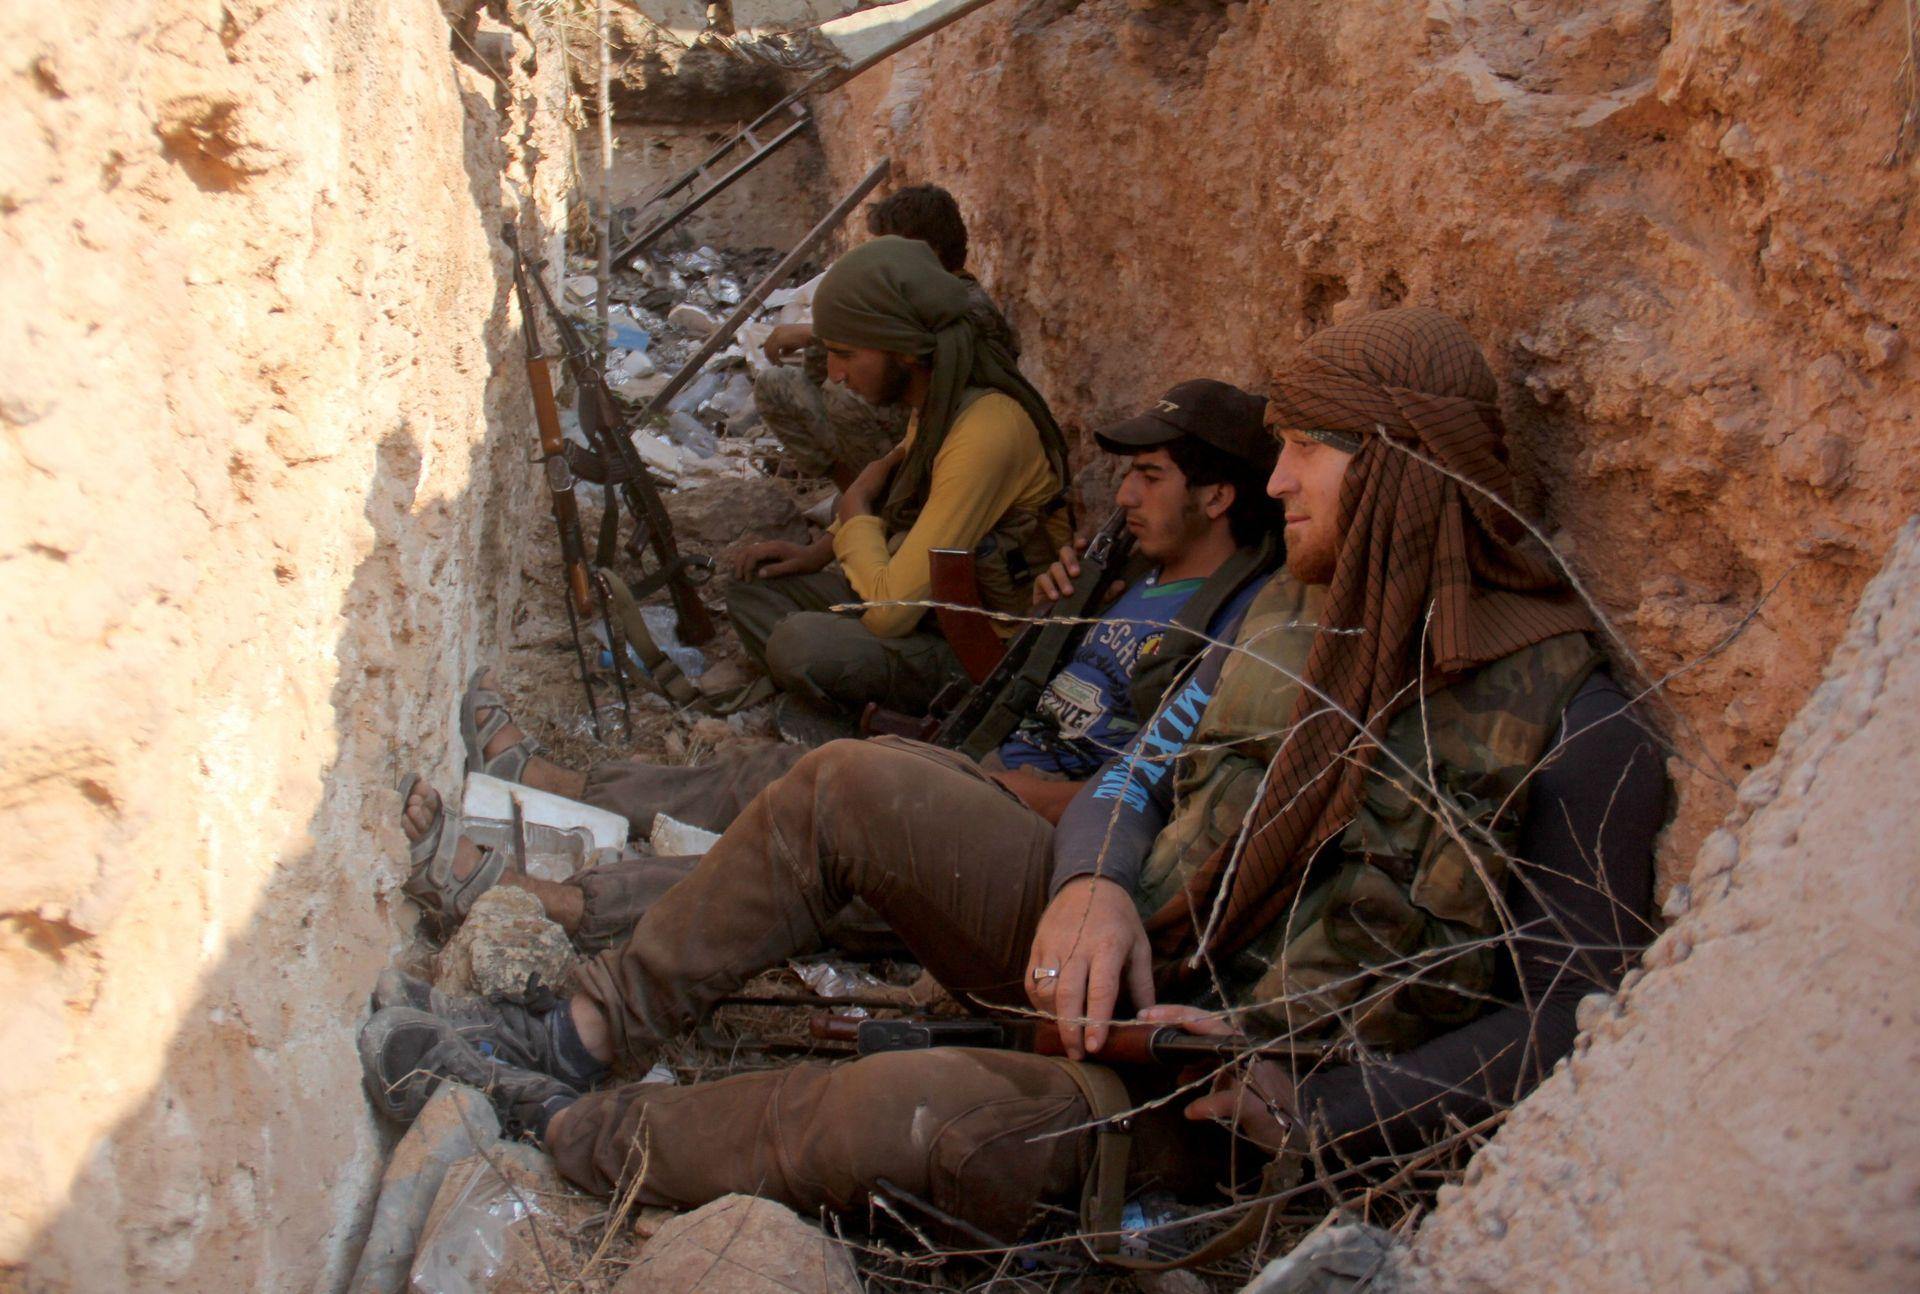 Qatar 'funneled millions of dollars' to Al-Qaeda-affiliate terrorists in Syria: British media